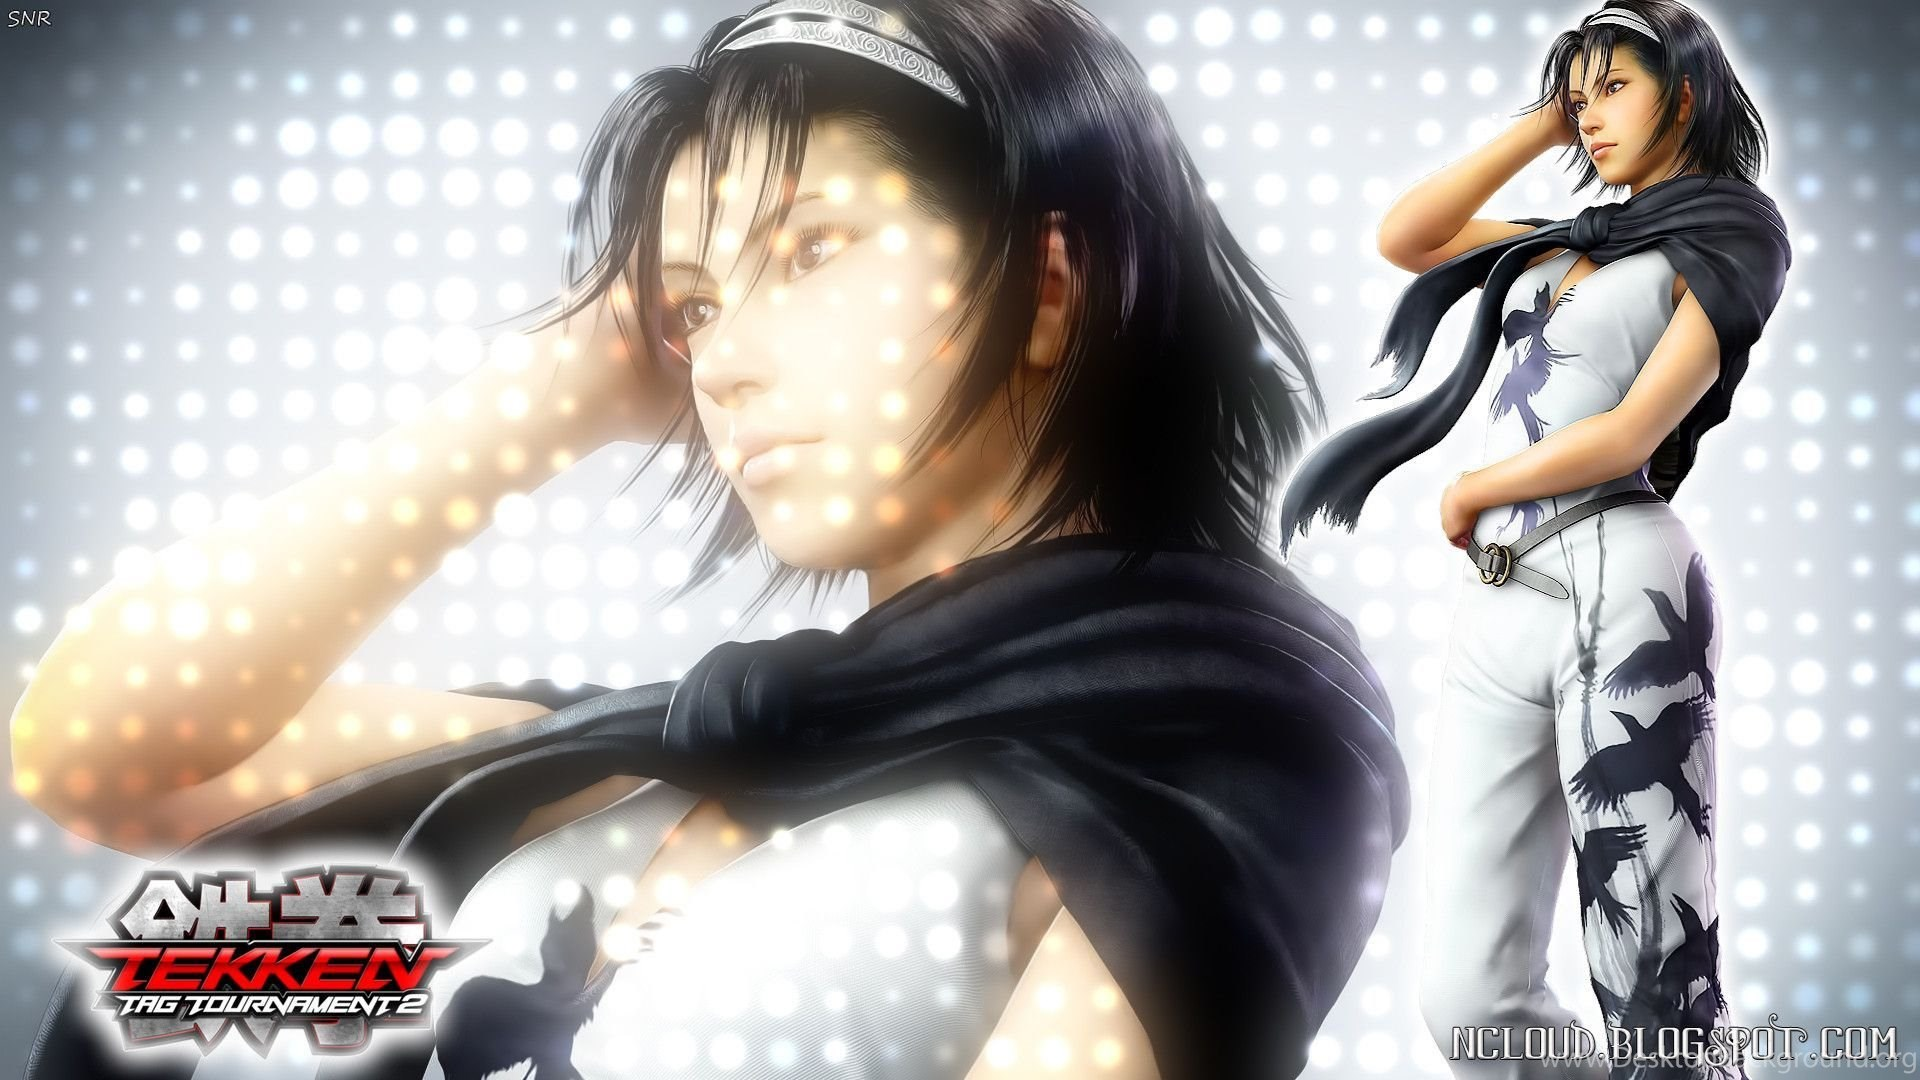 Tekken Tag Tournament 2 Wallpapers Wallpapers Cave Desktop Background